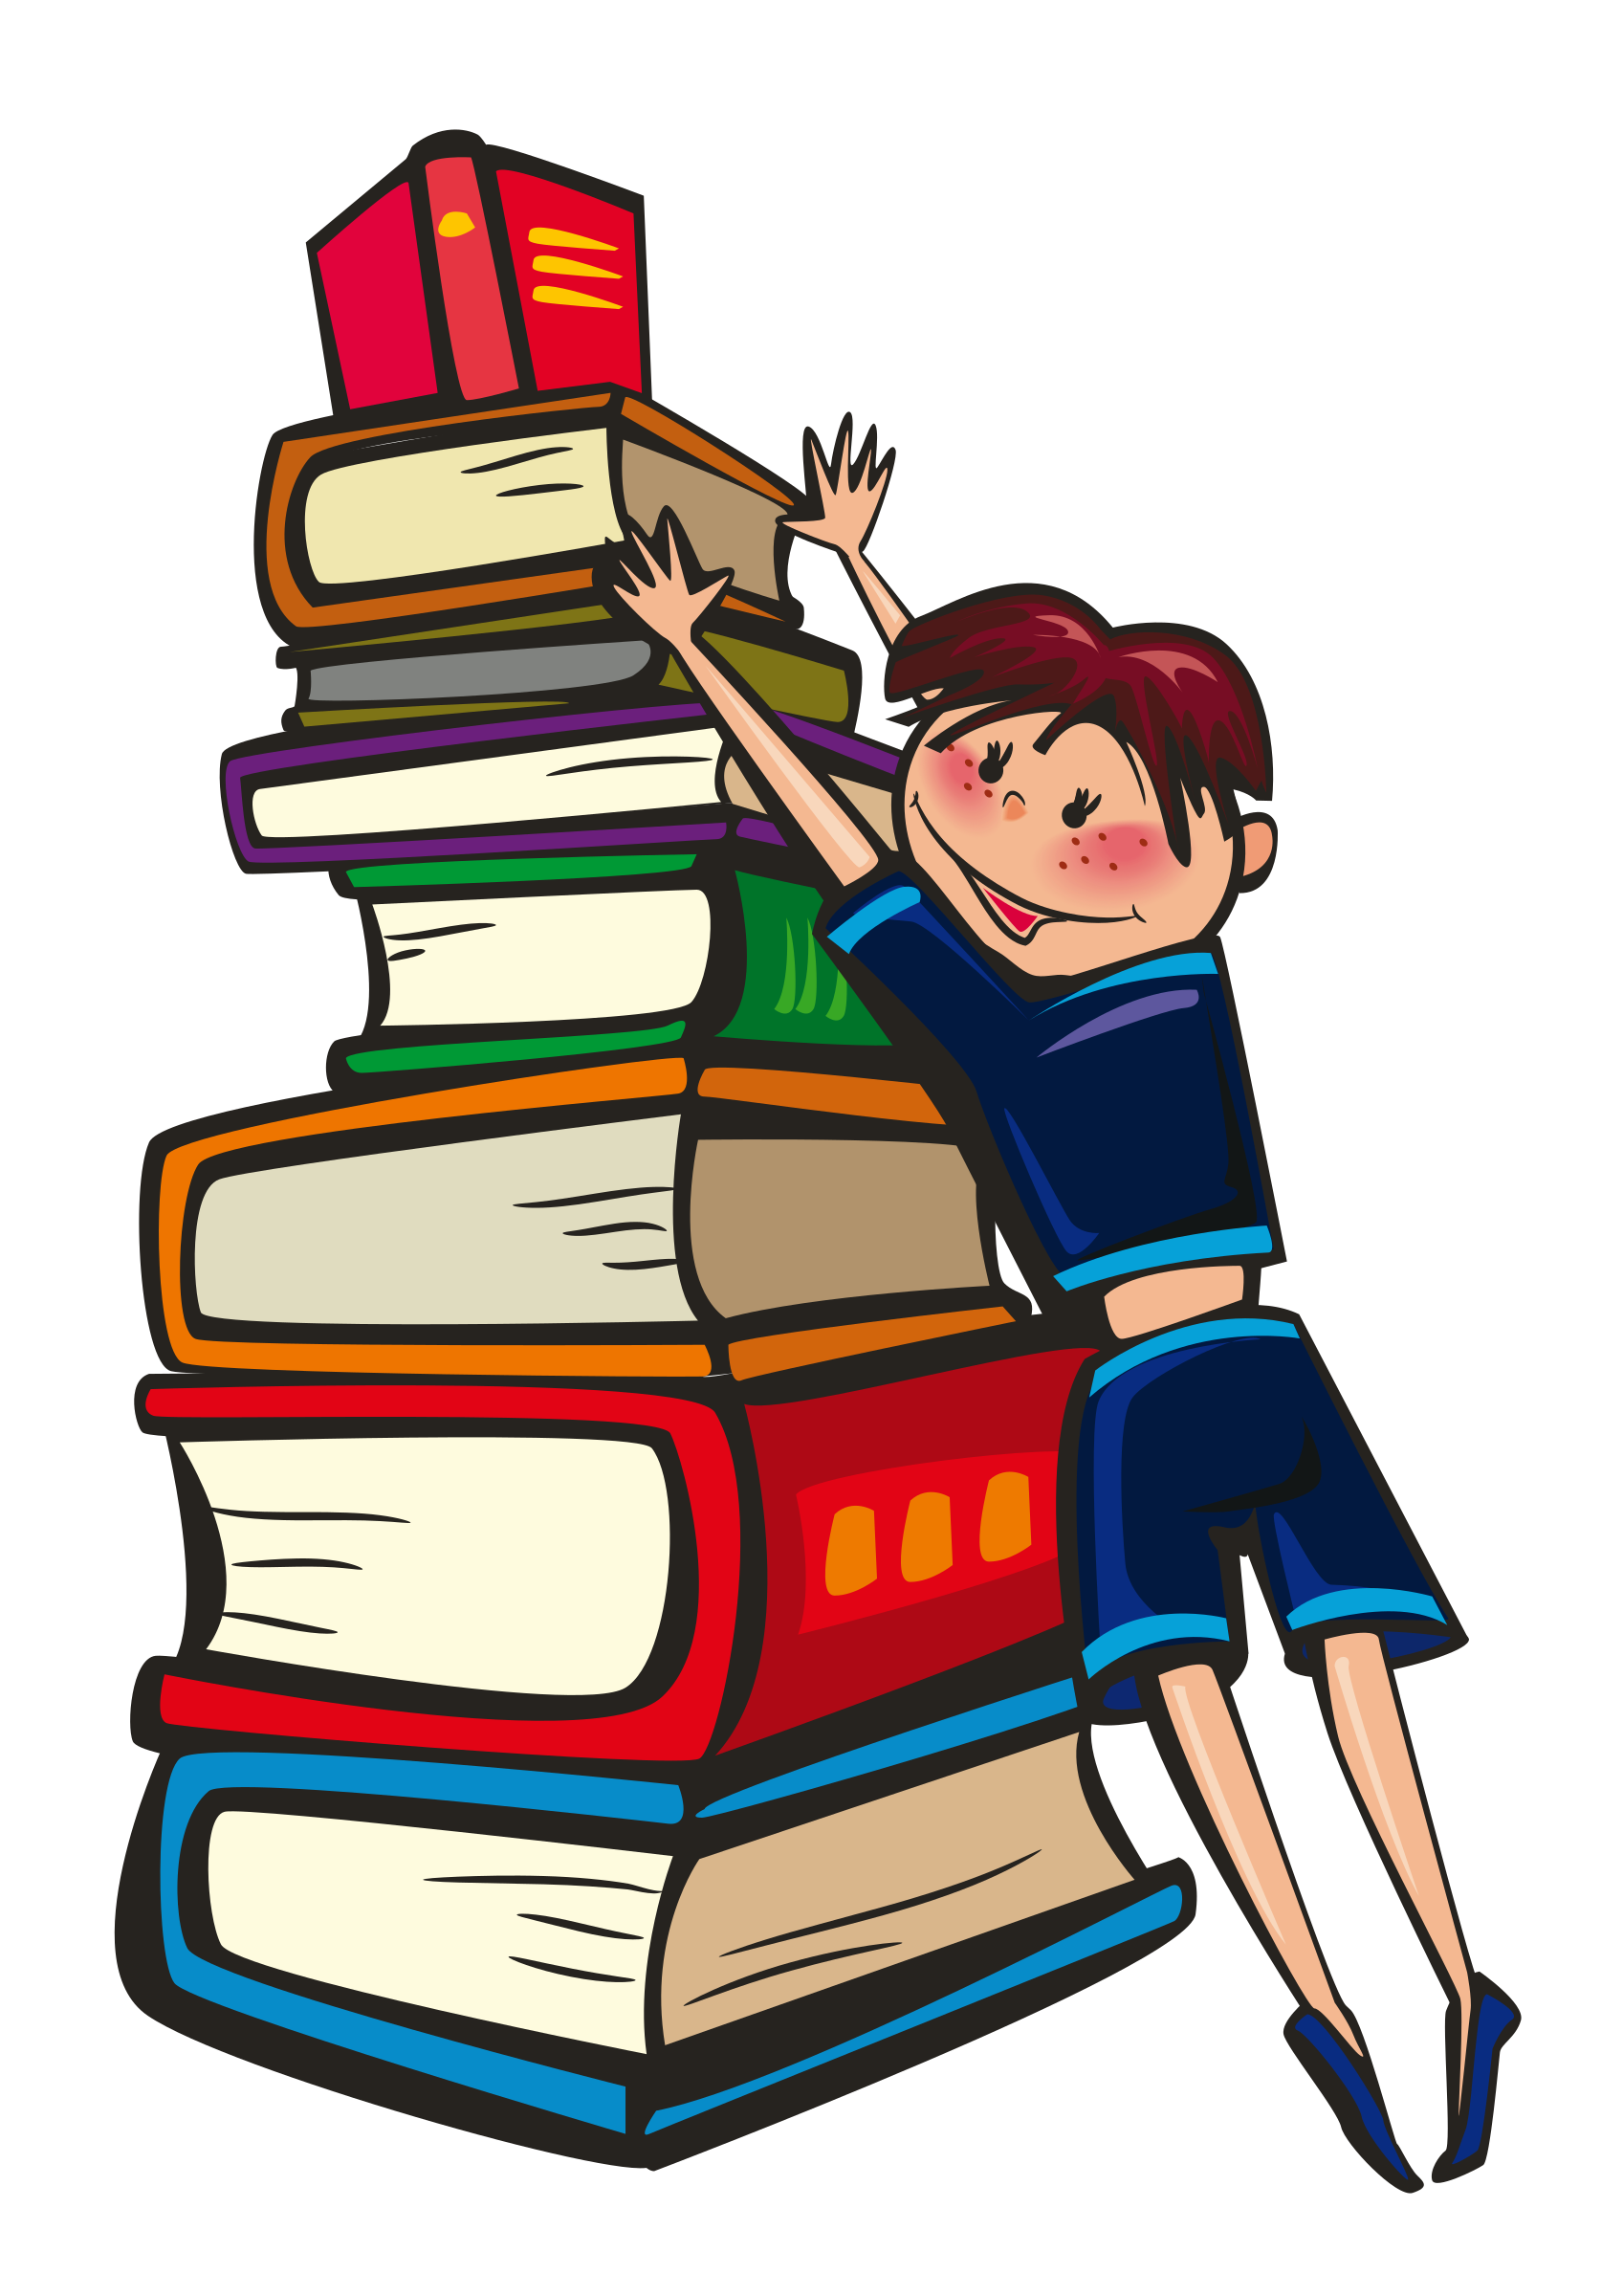 Free Cartoon Books Cliparts, Download Free Clip Art, Free.